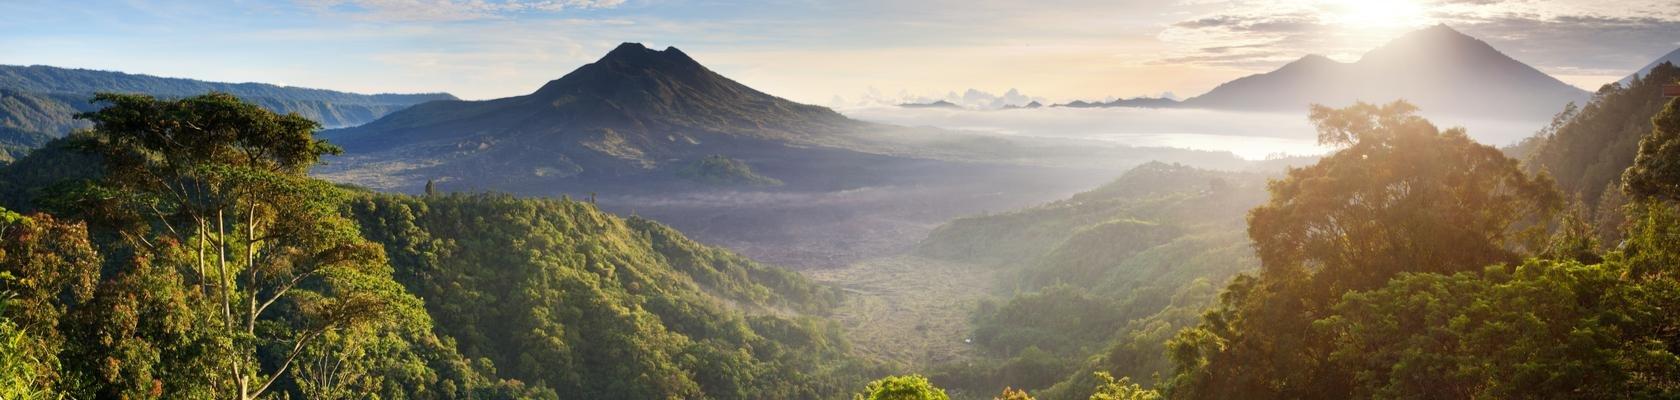 Groene en bergachtige binnenland van Bali